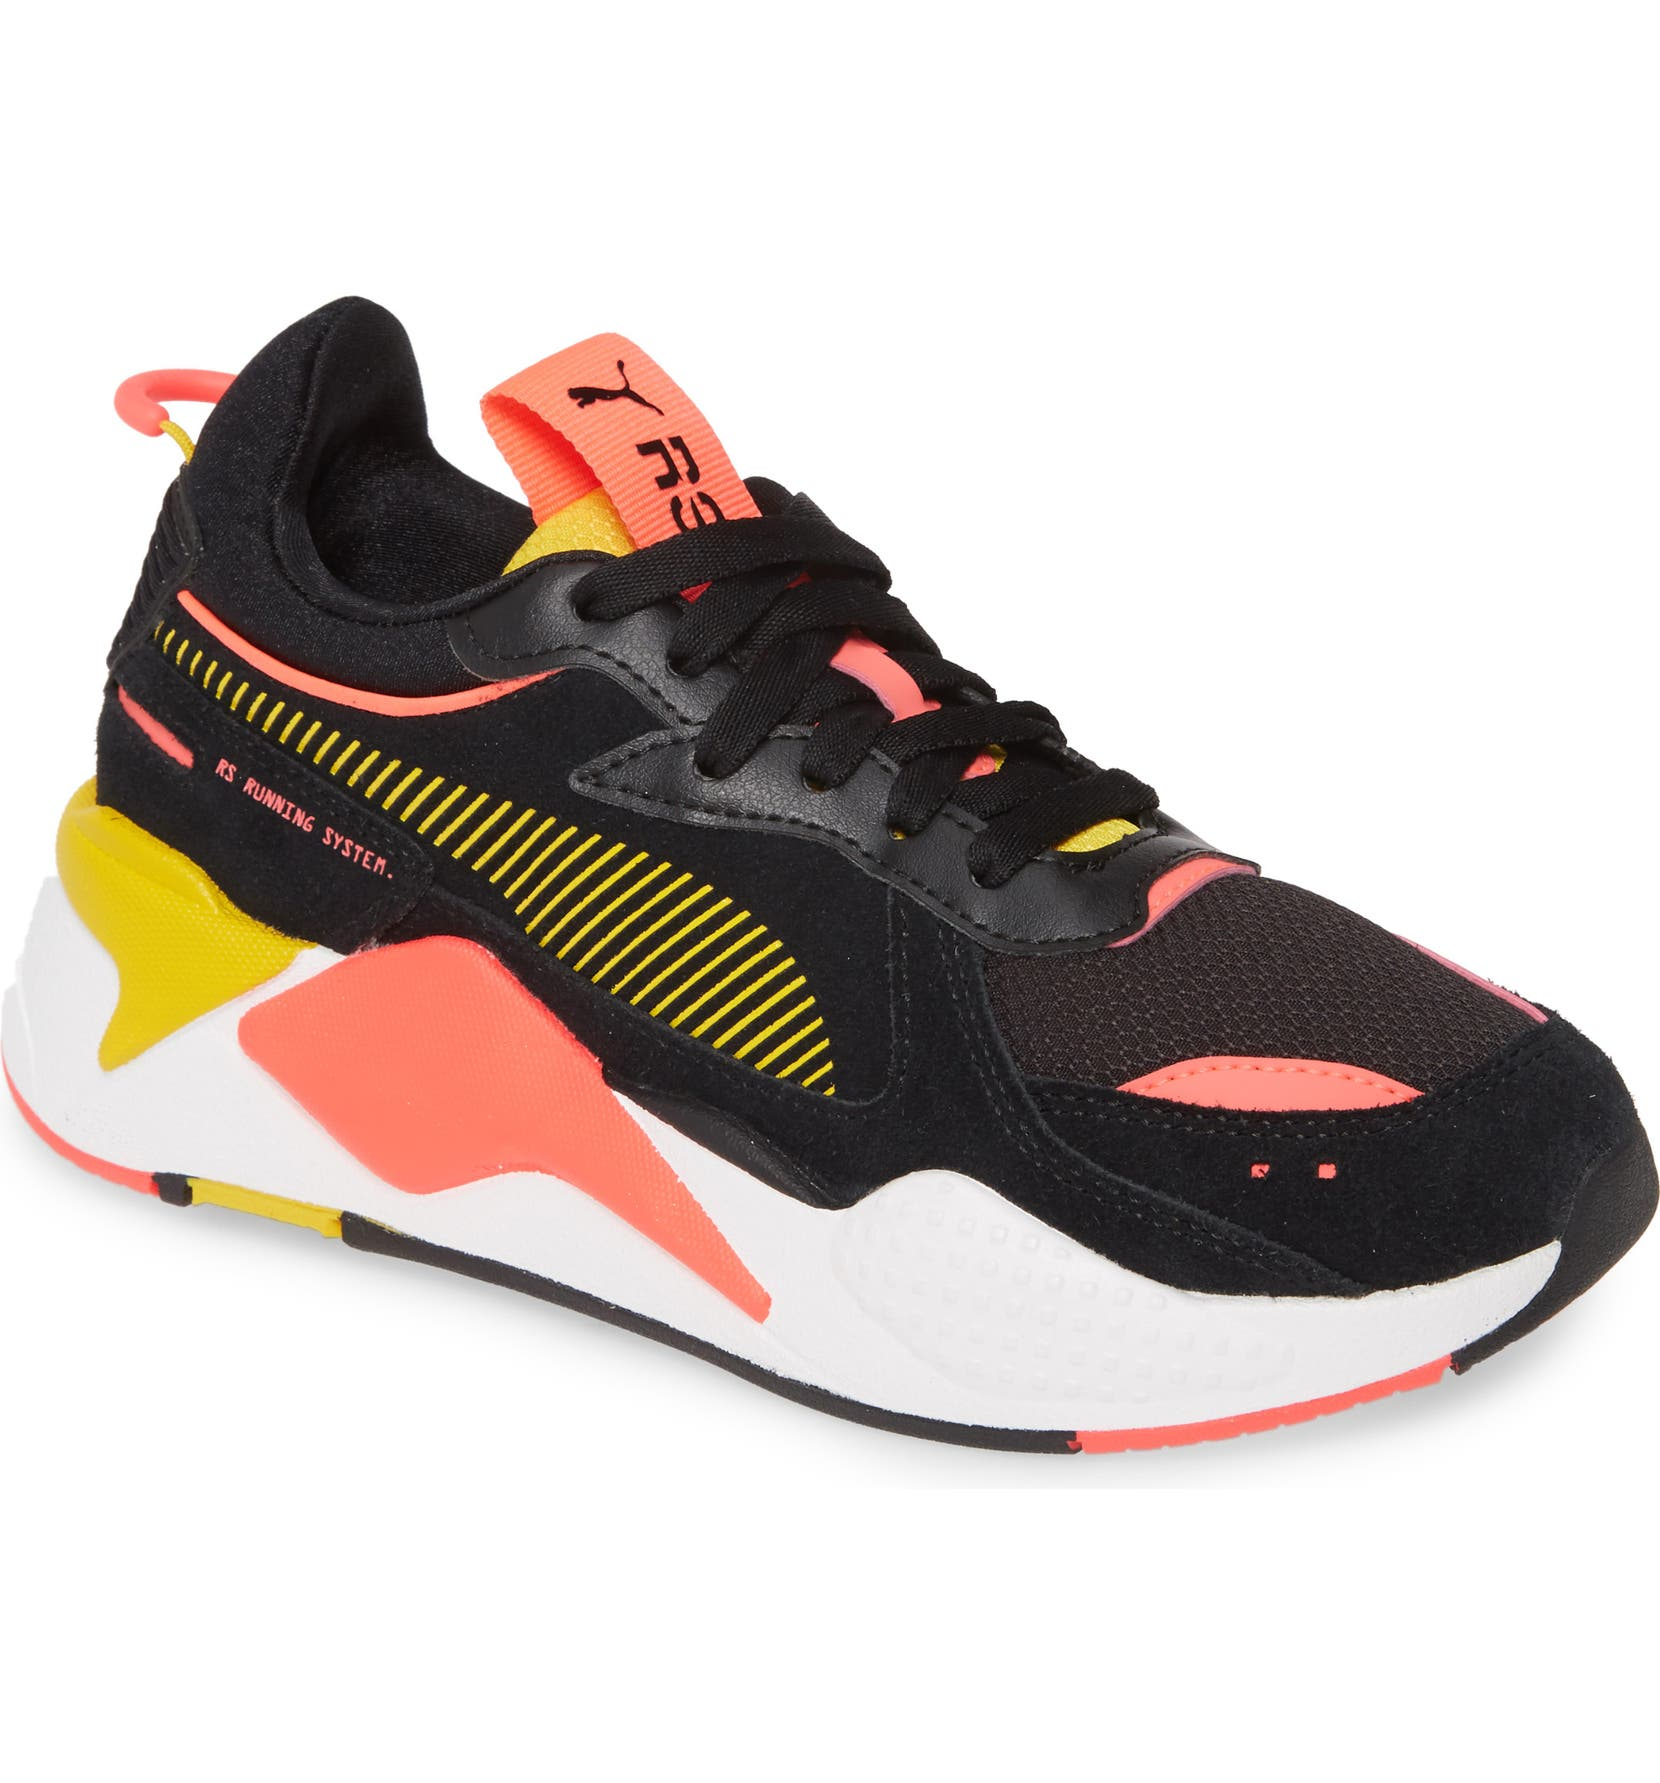 PUMA | Tazon Modern Sneaker | Nordstrom Rack